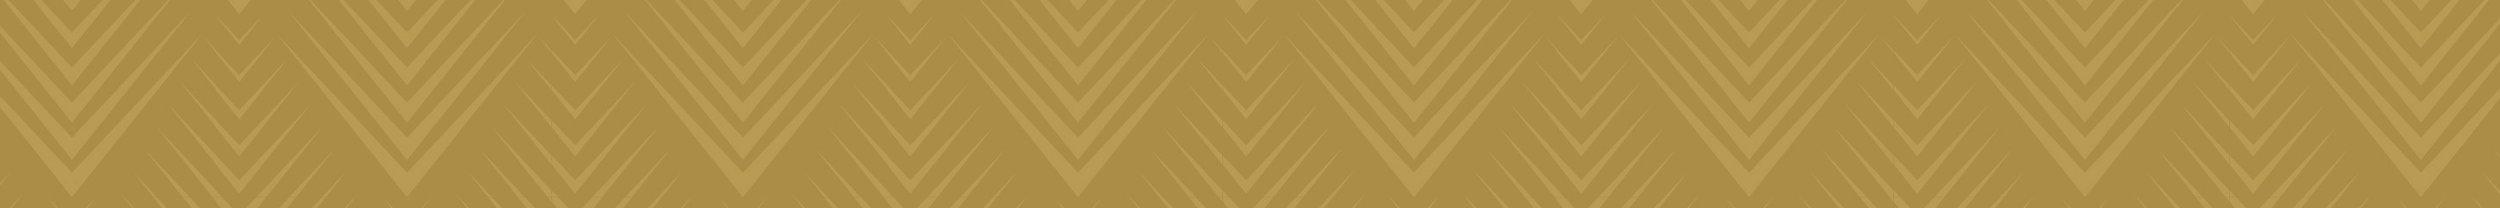 CYW-TextureGold-Stripe.jpg